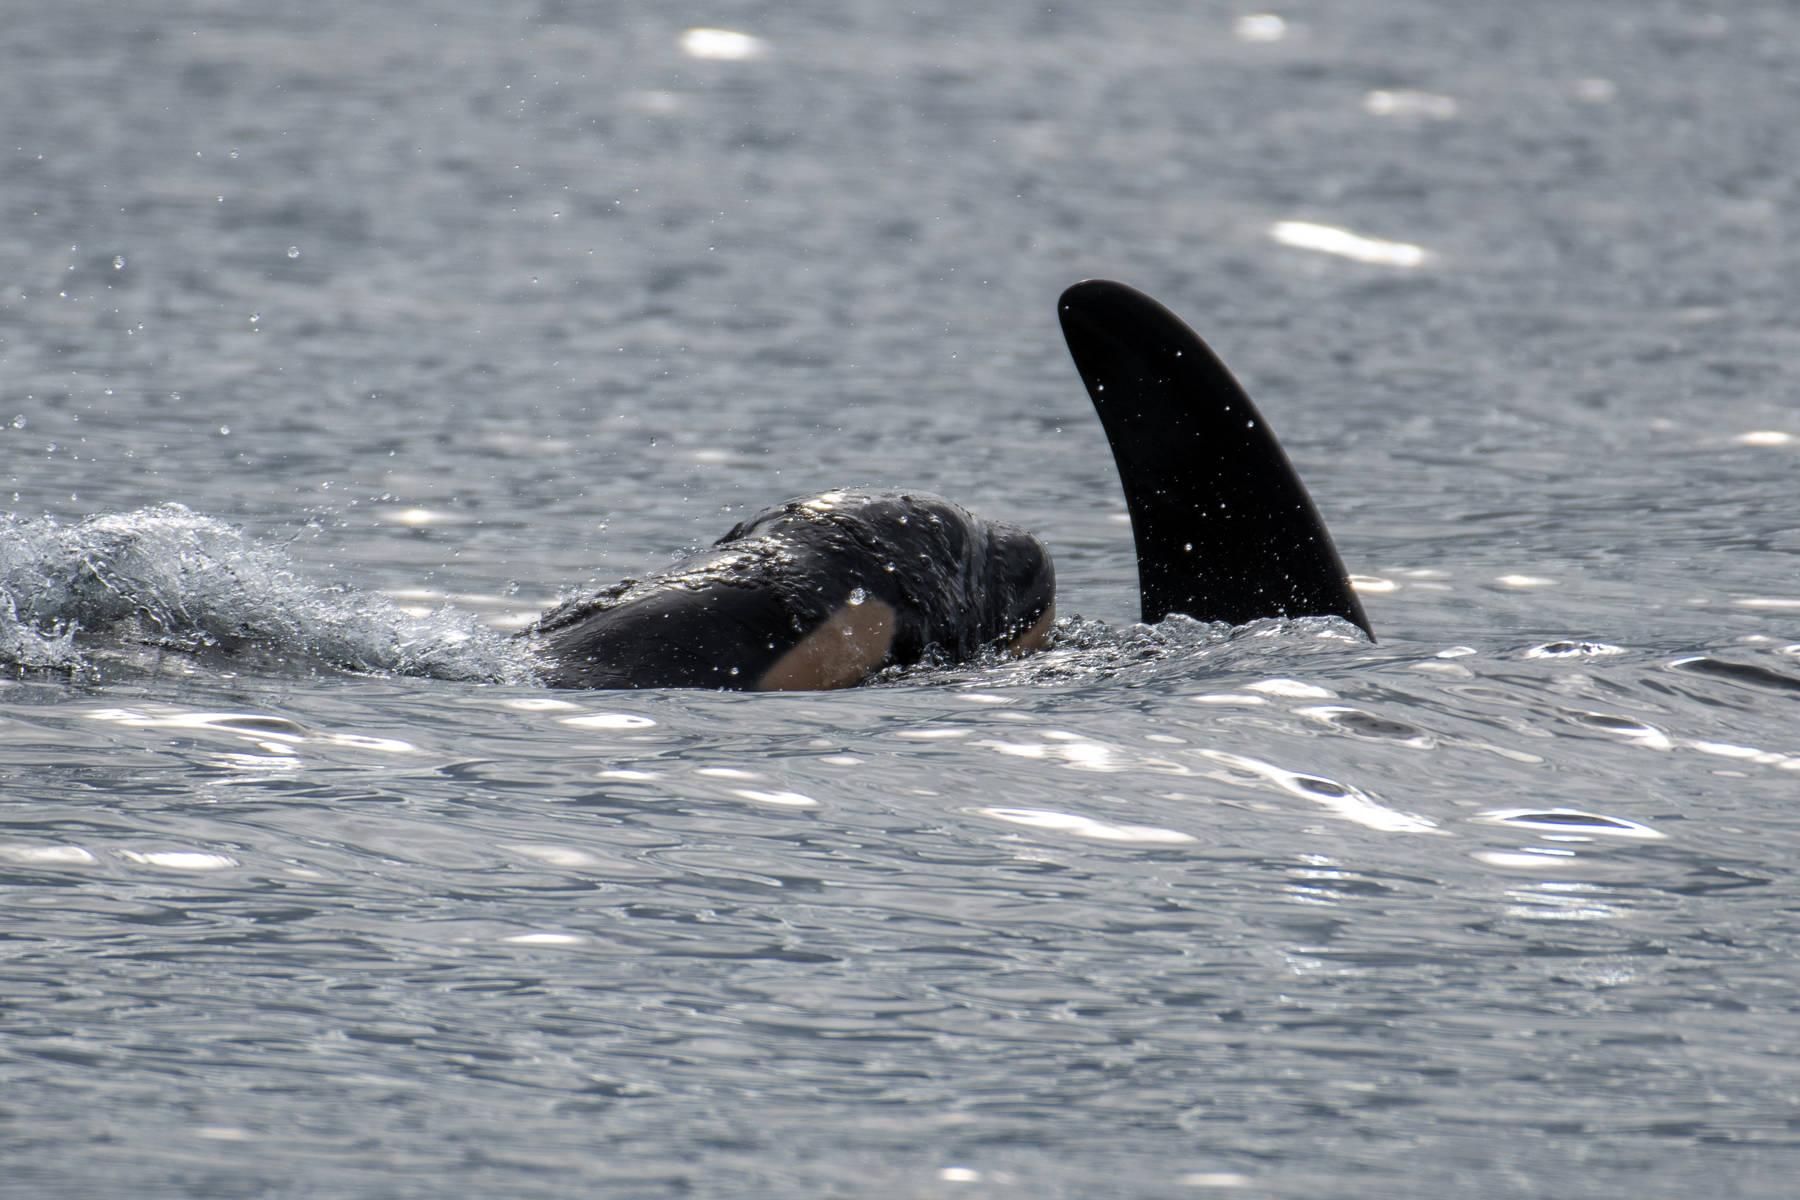 J Pod's newest calf, born Sept. 24, 2020 surfaces next to mother J41. (Leaha Vanderwiel/Orca Spirit Adventures/Pacific Whale Watch Association)